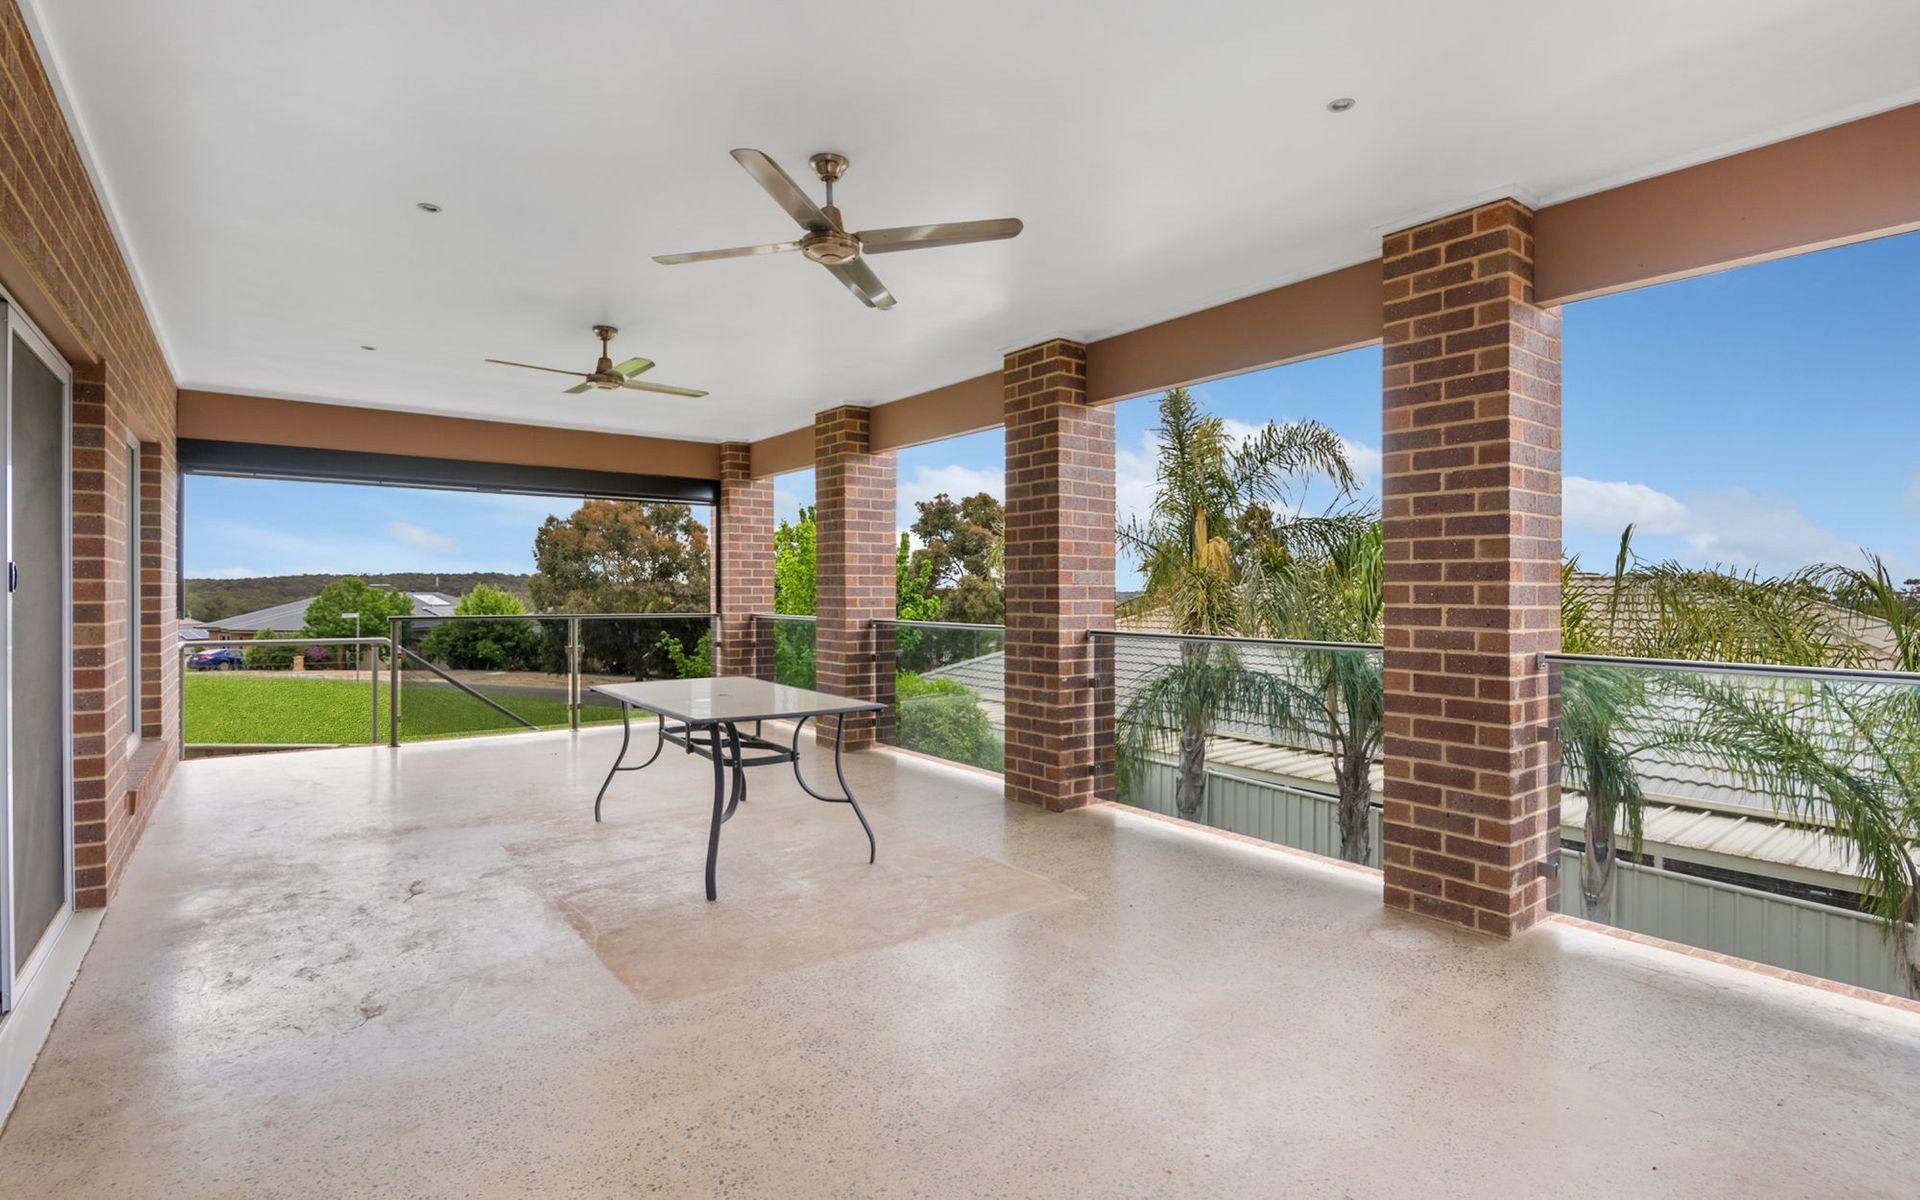 2 Arilpa Court, Kangaroo Flat, VIC 3555